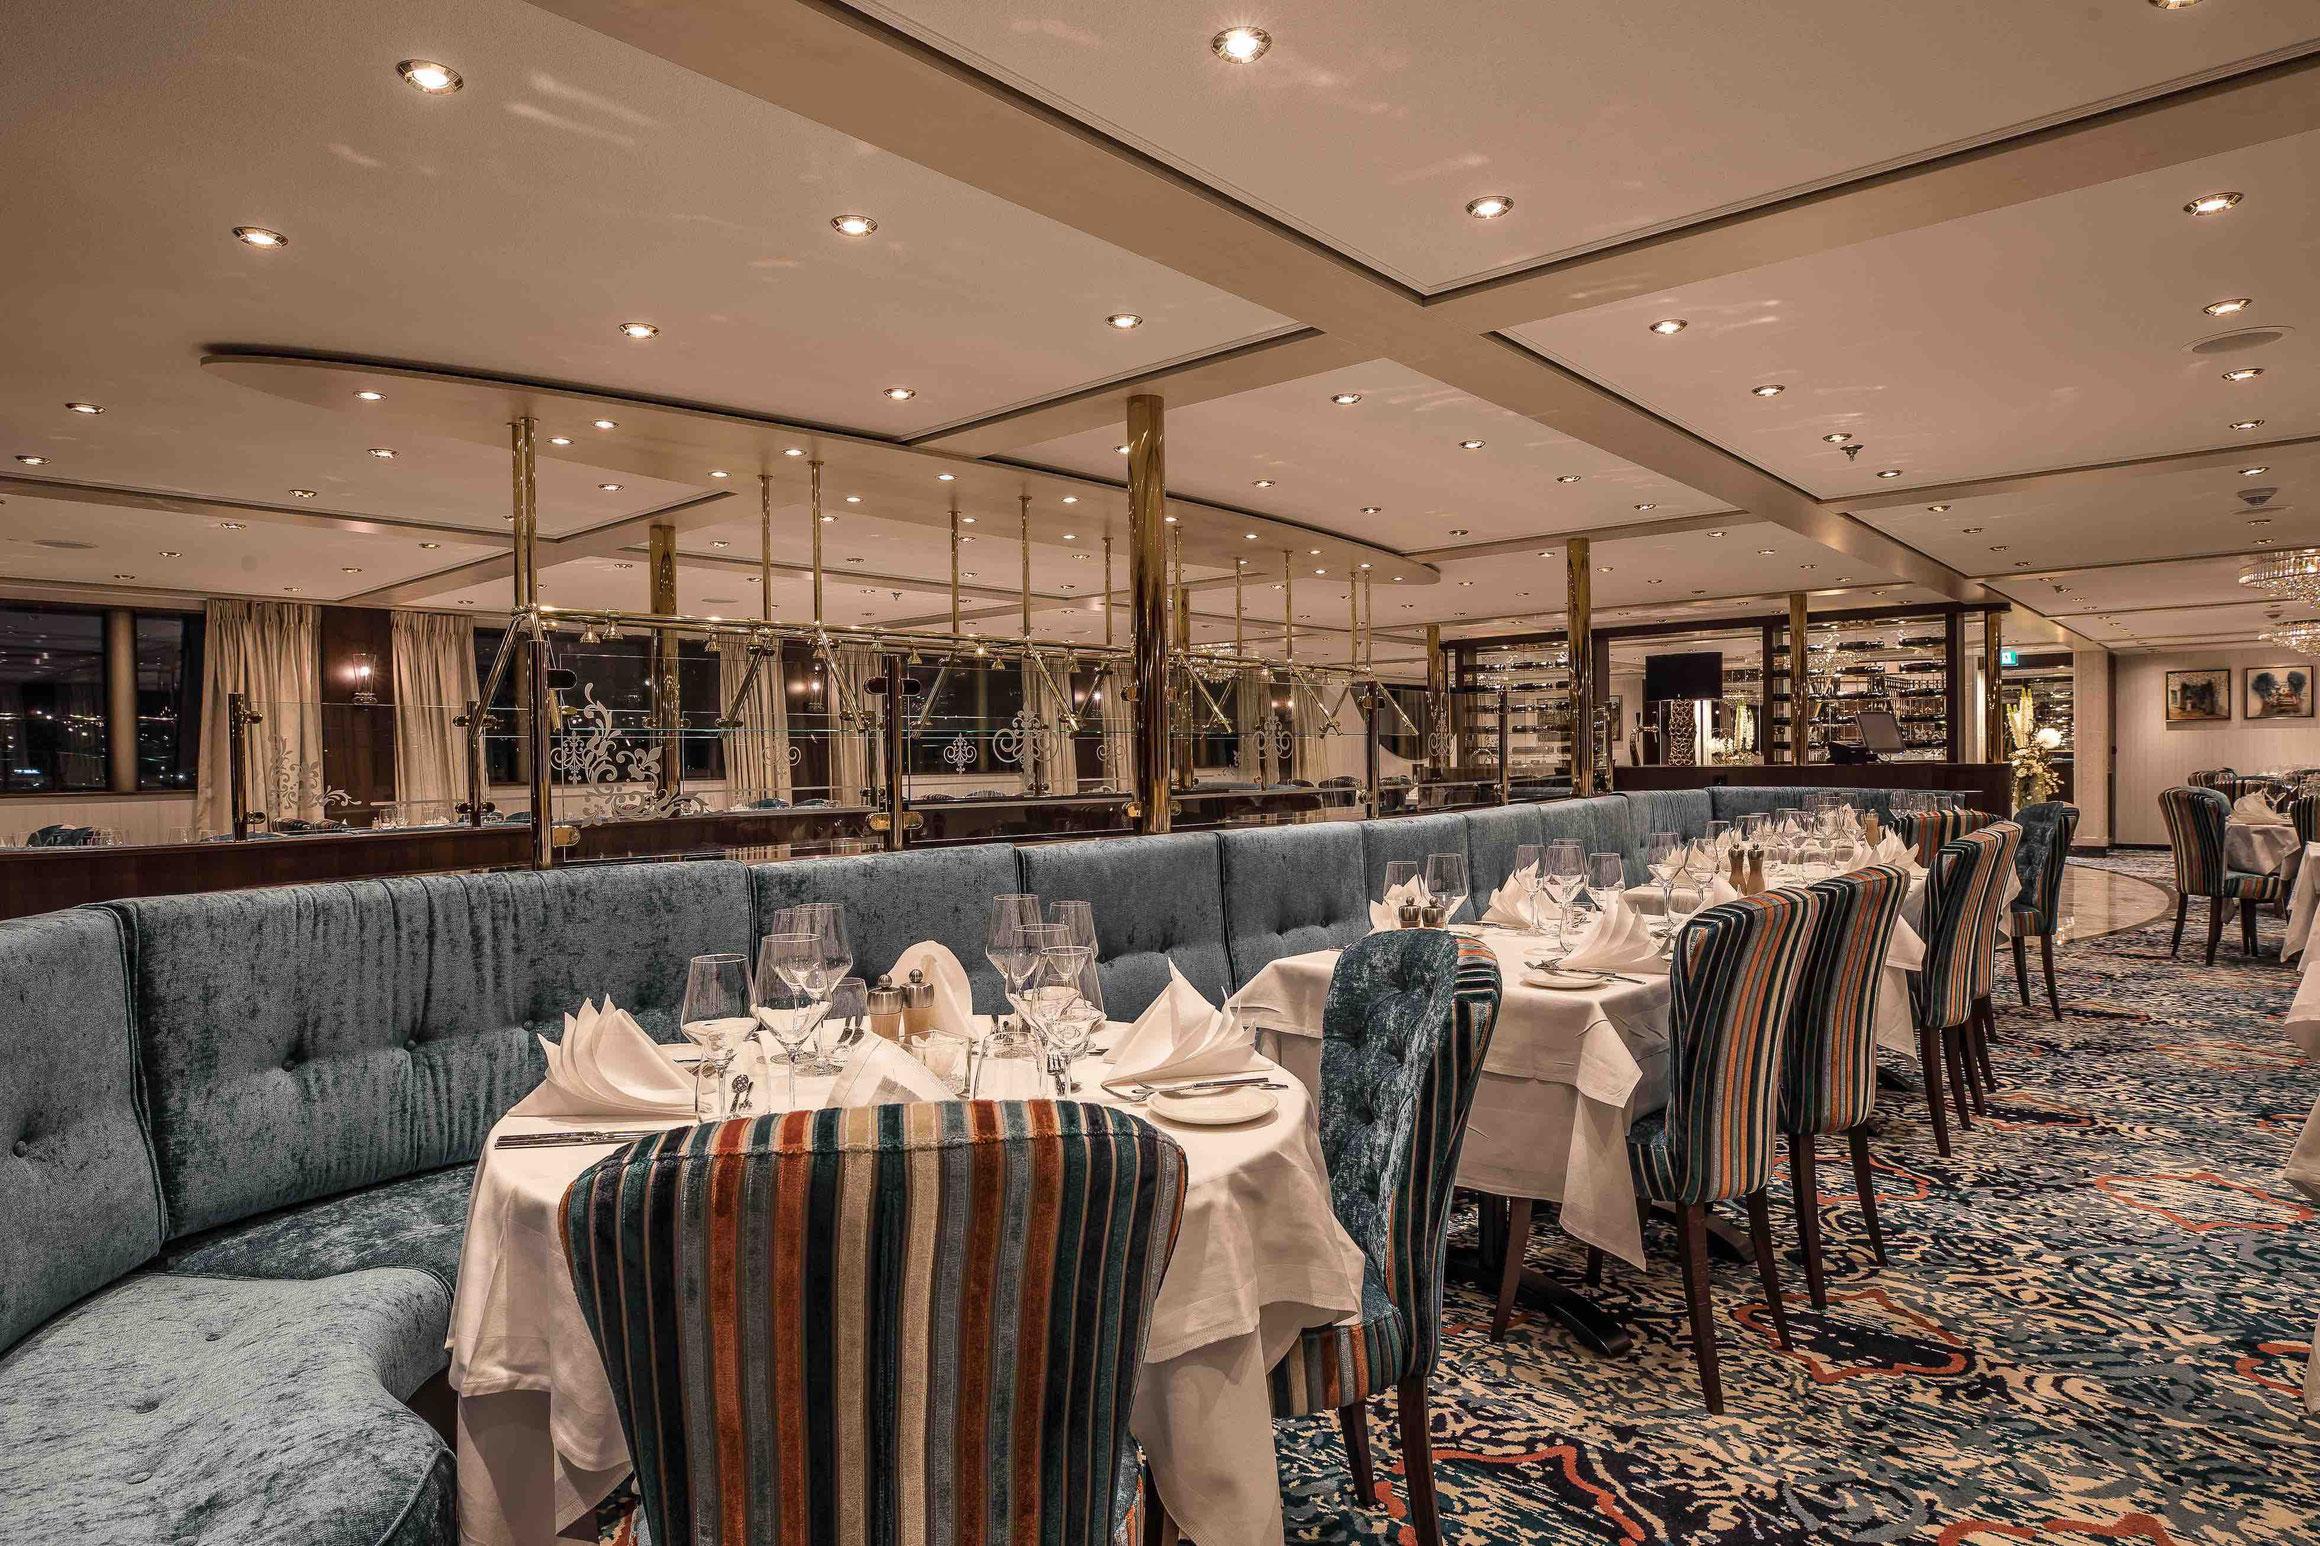 MS George Eliot Panorama Restaurant